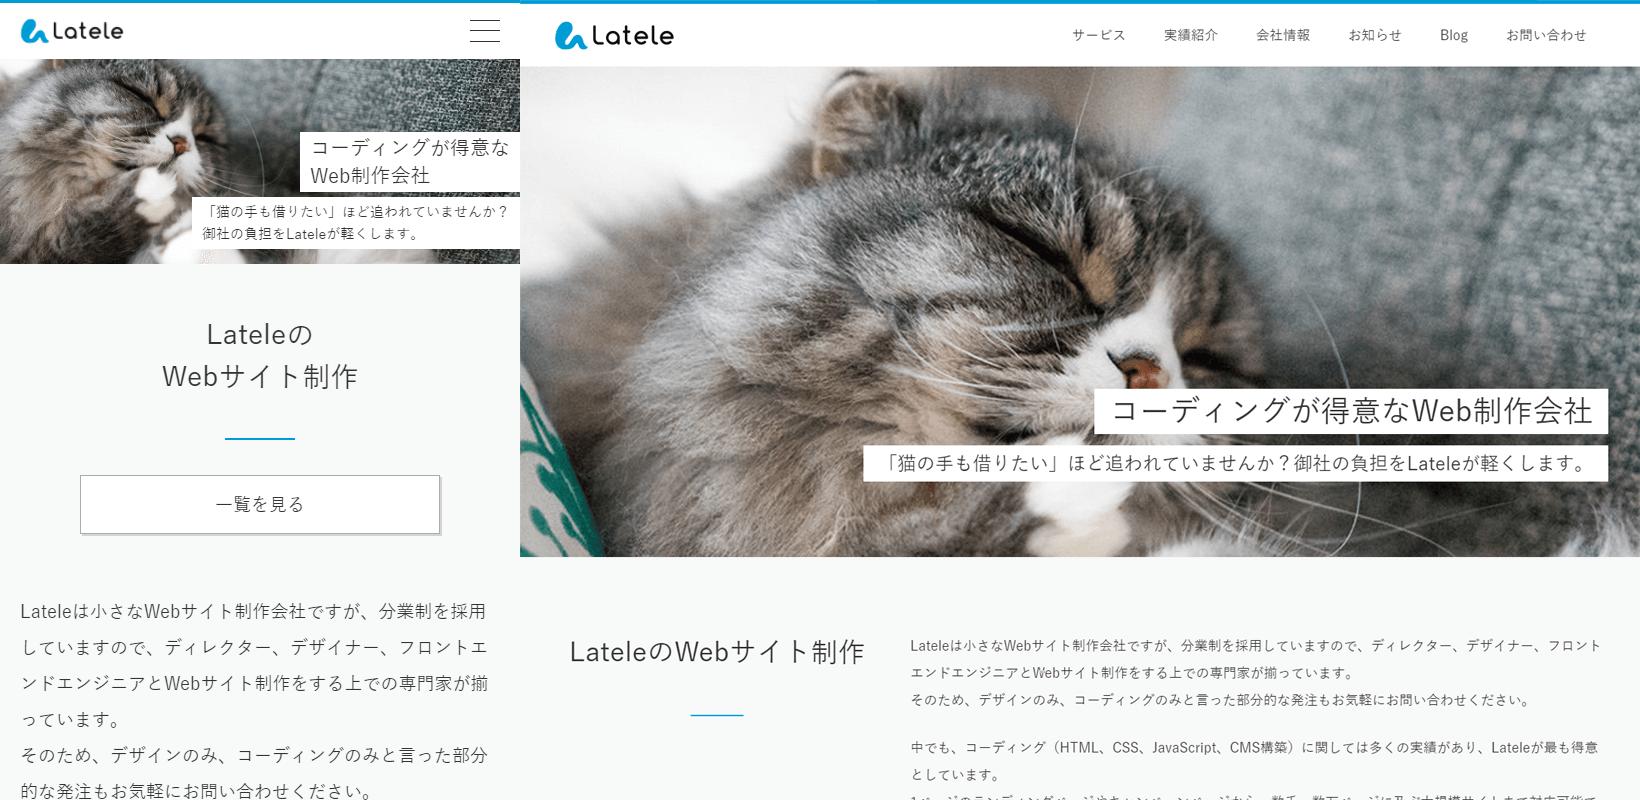 Lateleのサイトをリニューアルしましたのイメージ画像